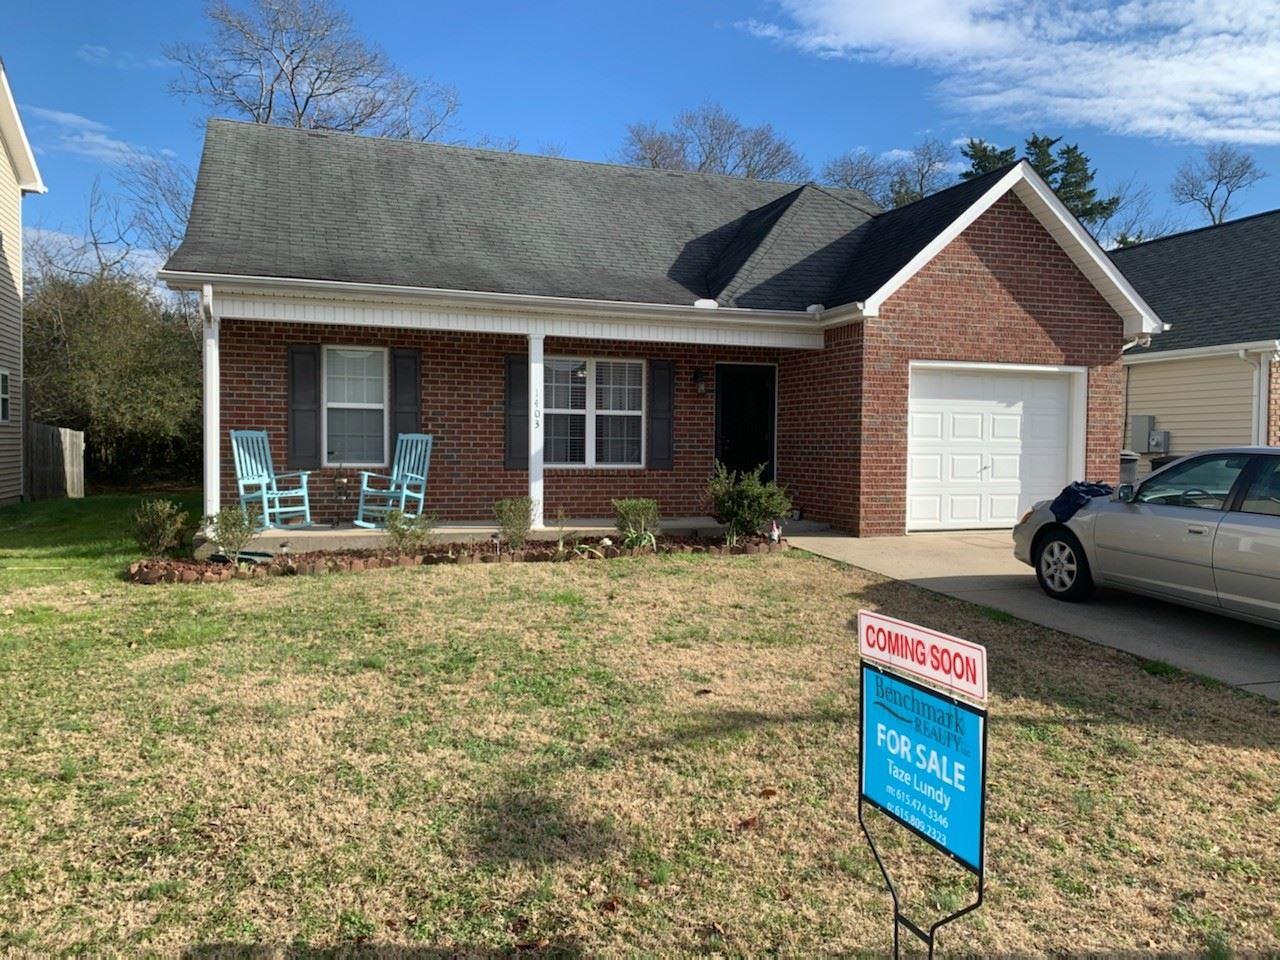 Photo of 1403 Sunray Dr, Murfreesboro, TN 37127 (MLS # 2211143)